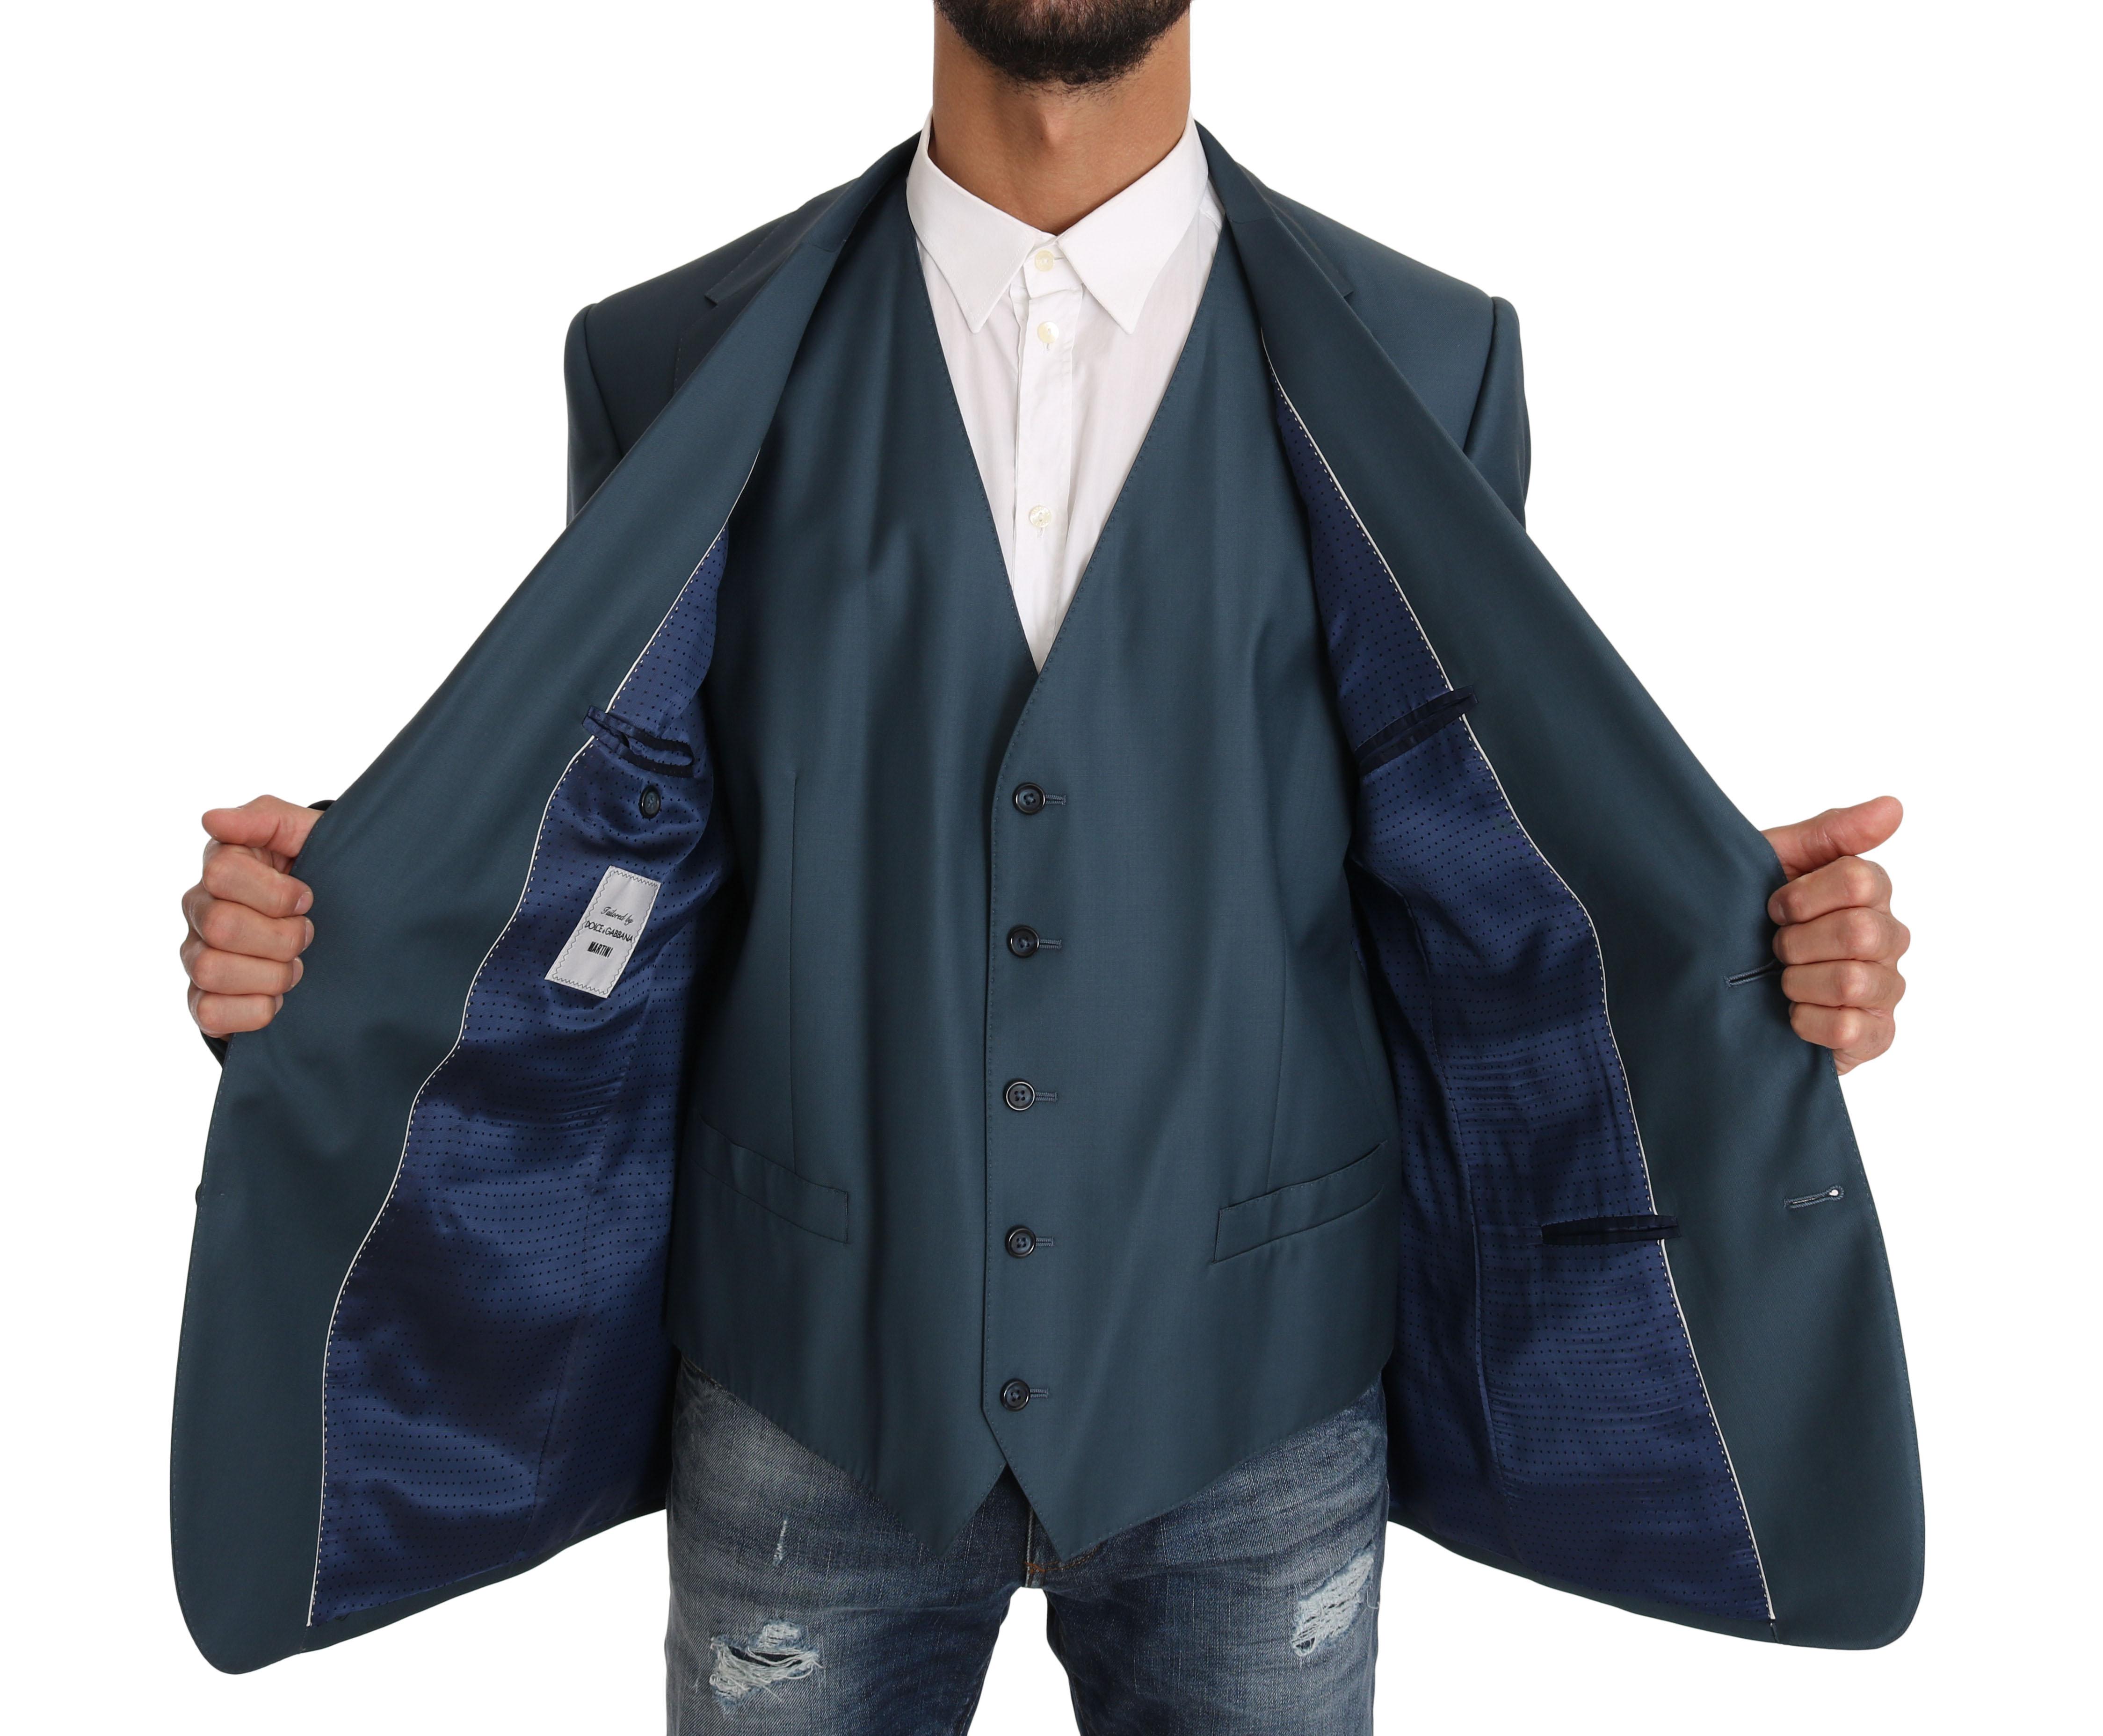 Dolce & Gabbana Men's Vest 2 Piece MARTINI Wool Blazer Blue KOS1187 - IT56 | 3XL